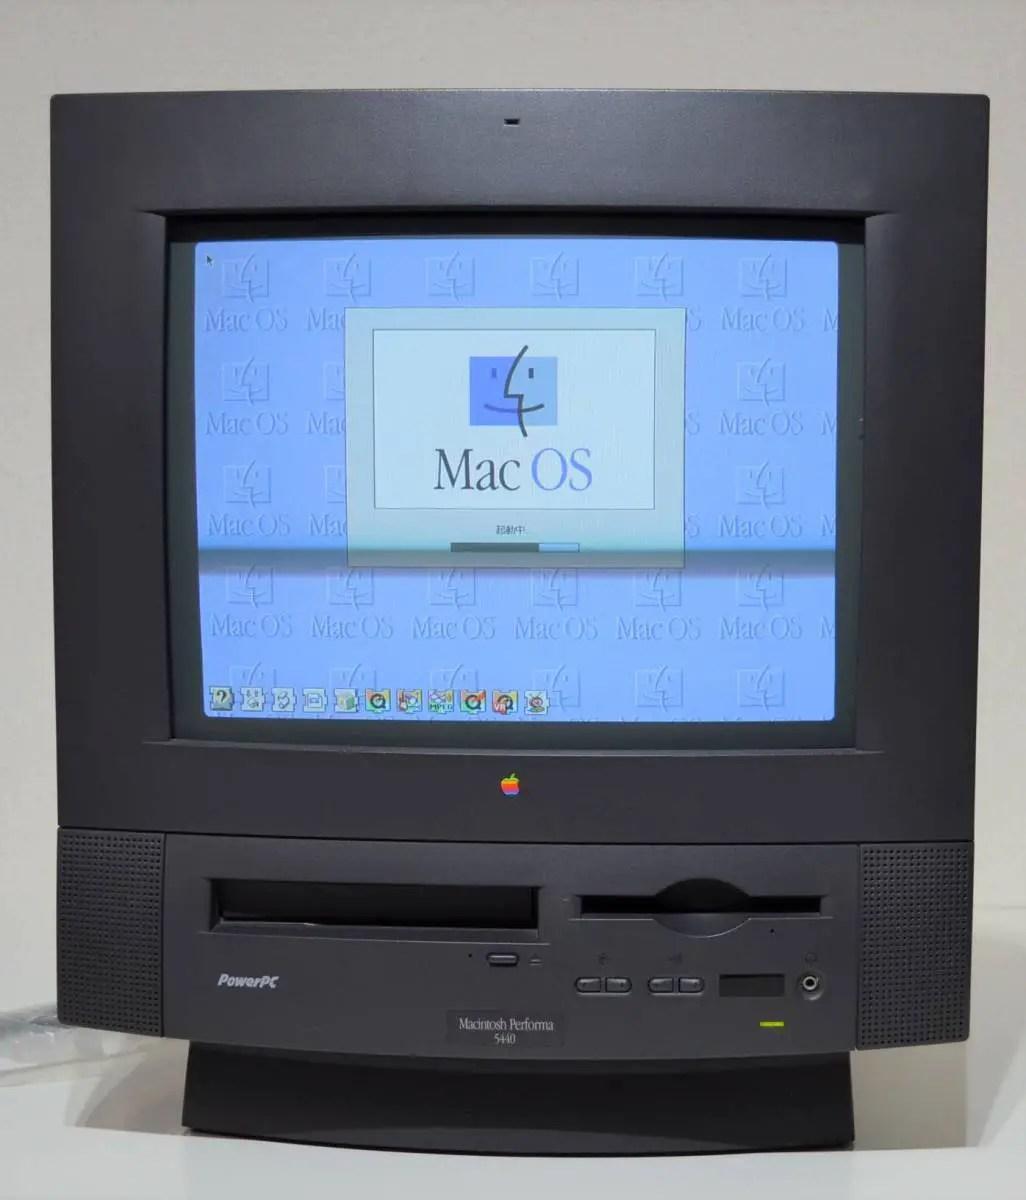 Macintosh Performa 5440